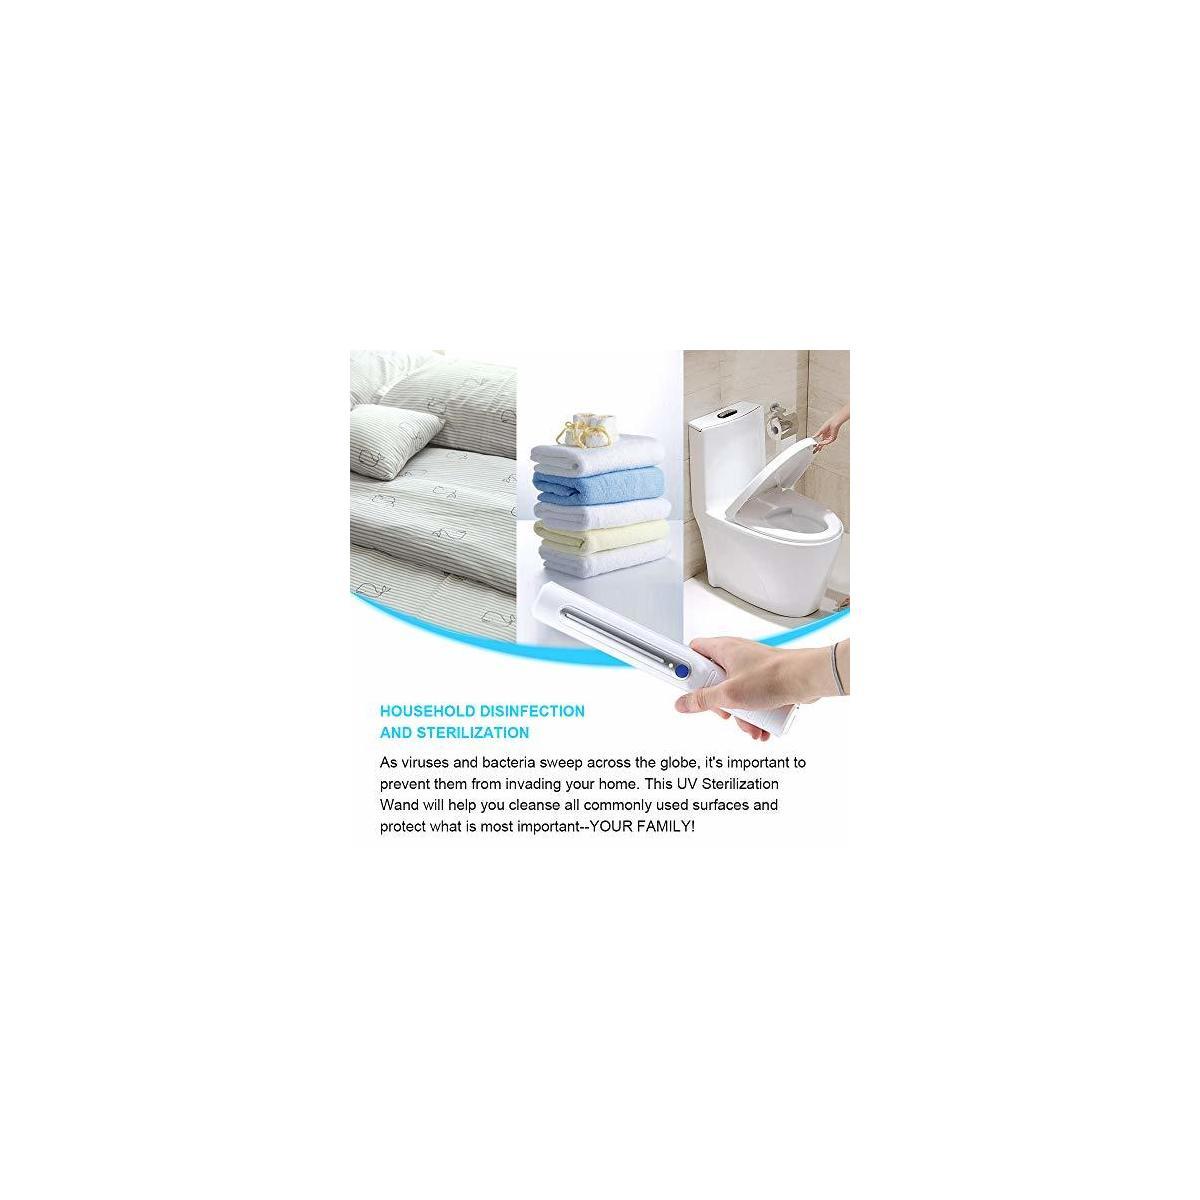 Portable UV Light Sanitizer Kills 99.5% of germs